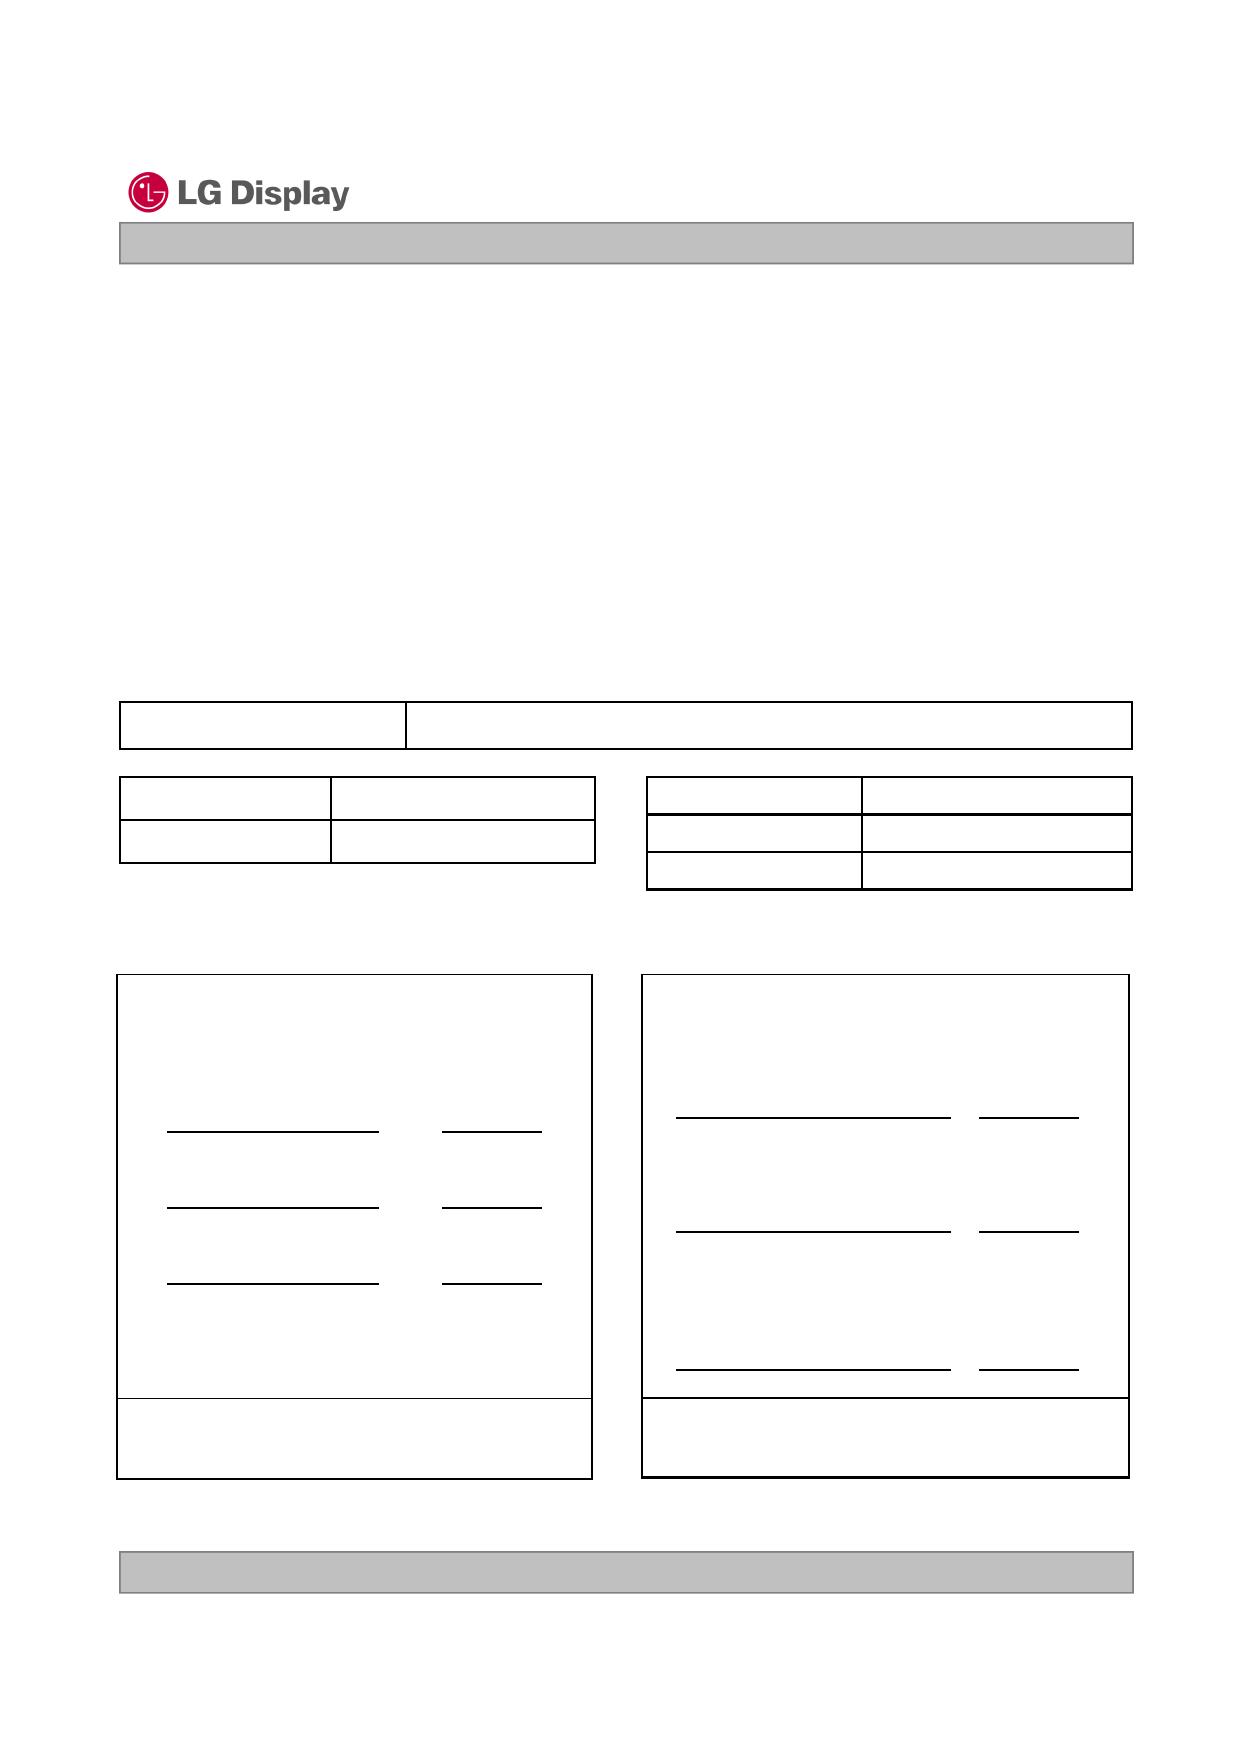 LP156WH3-TLAA 데이터시트 및 LP156WH3-TLAA PDF